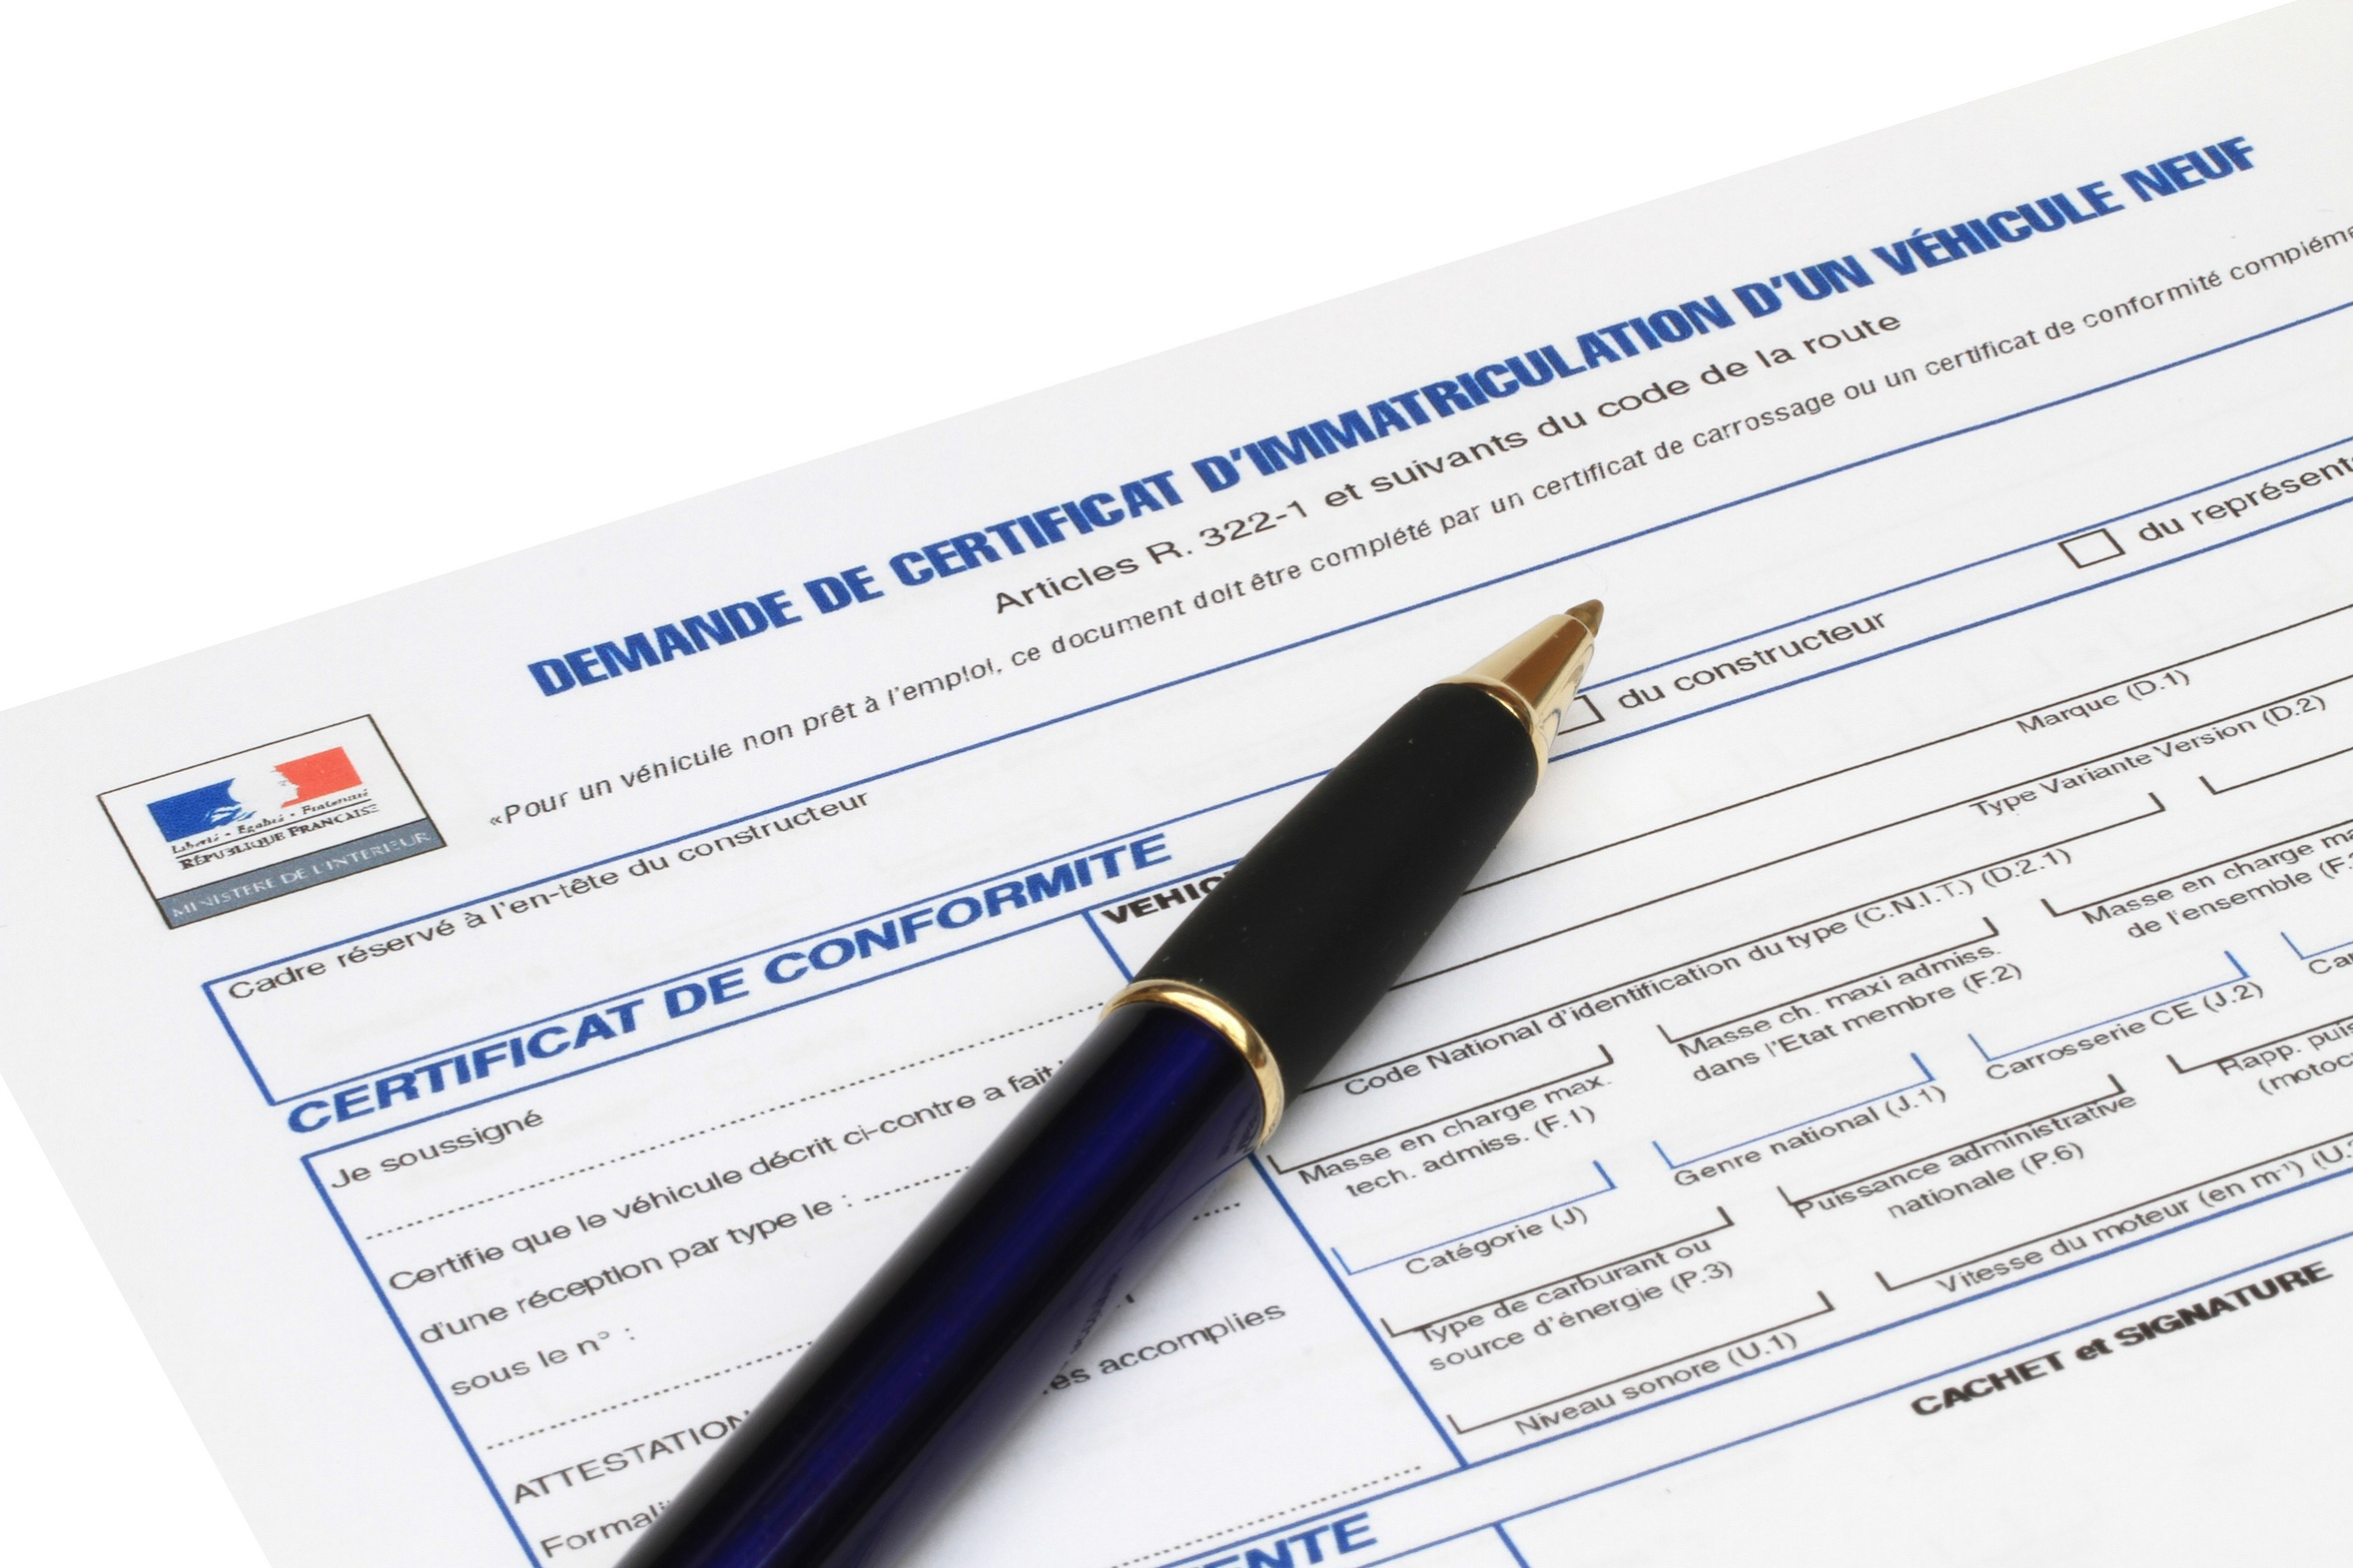 Demande d'immatriculation véhicule